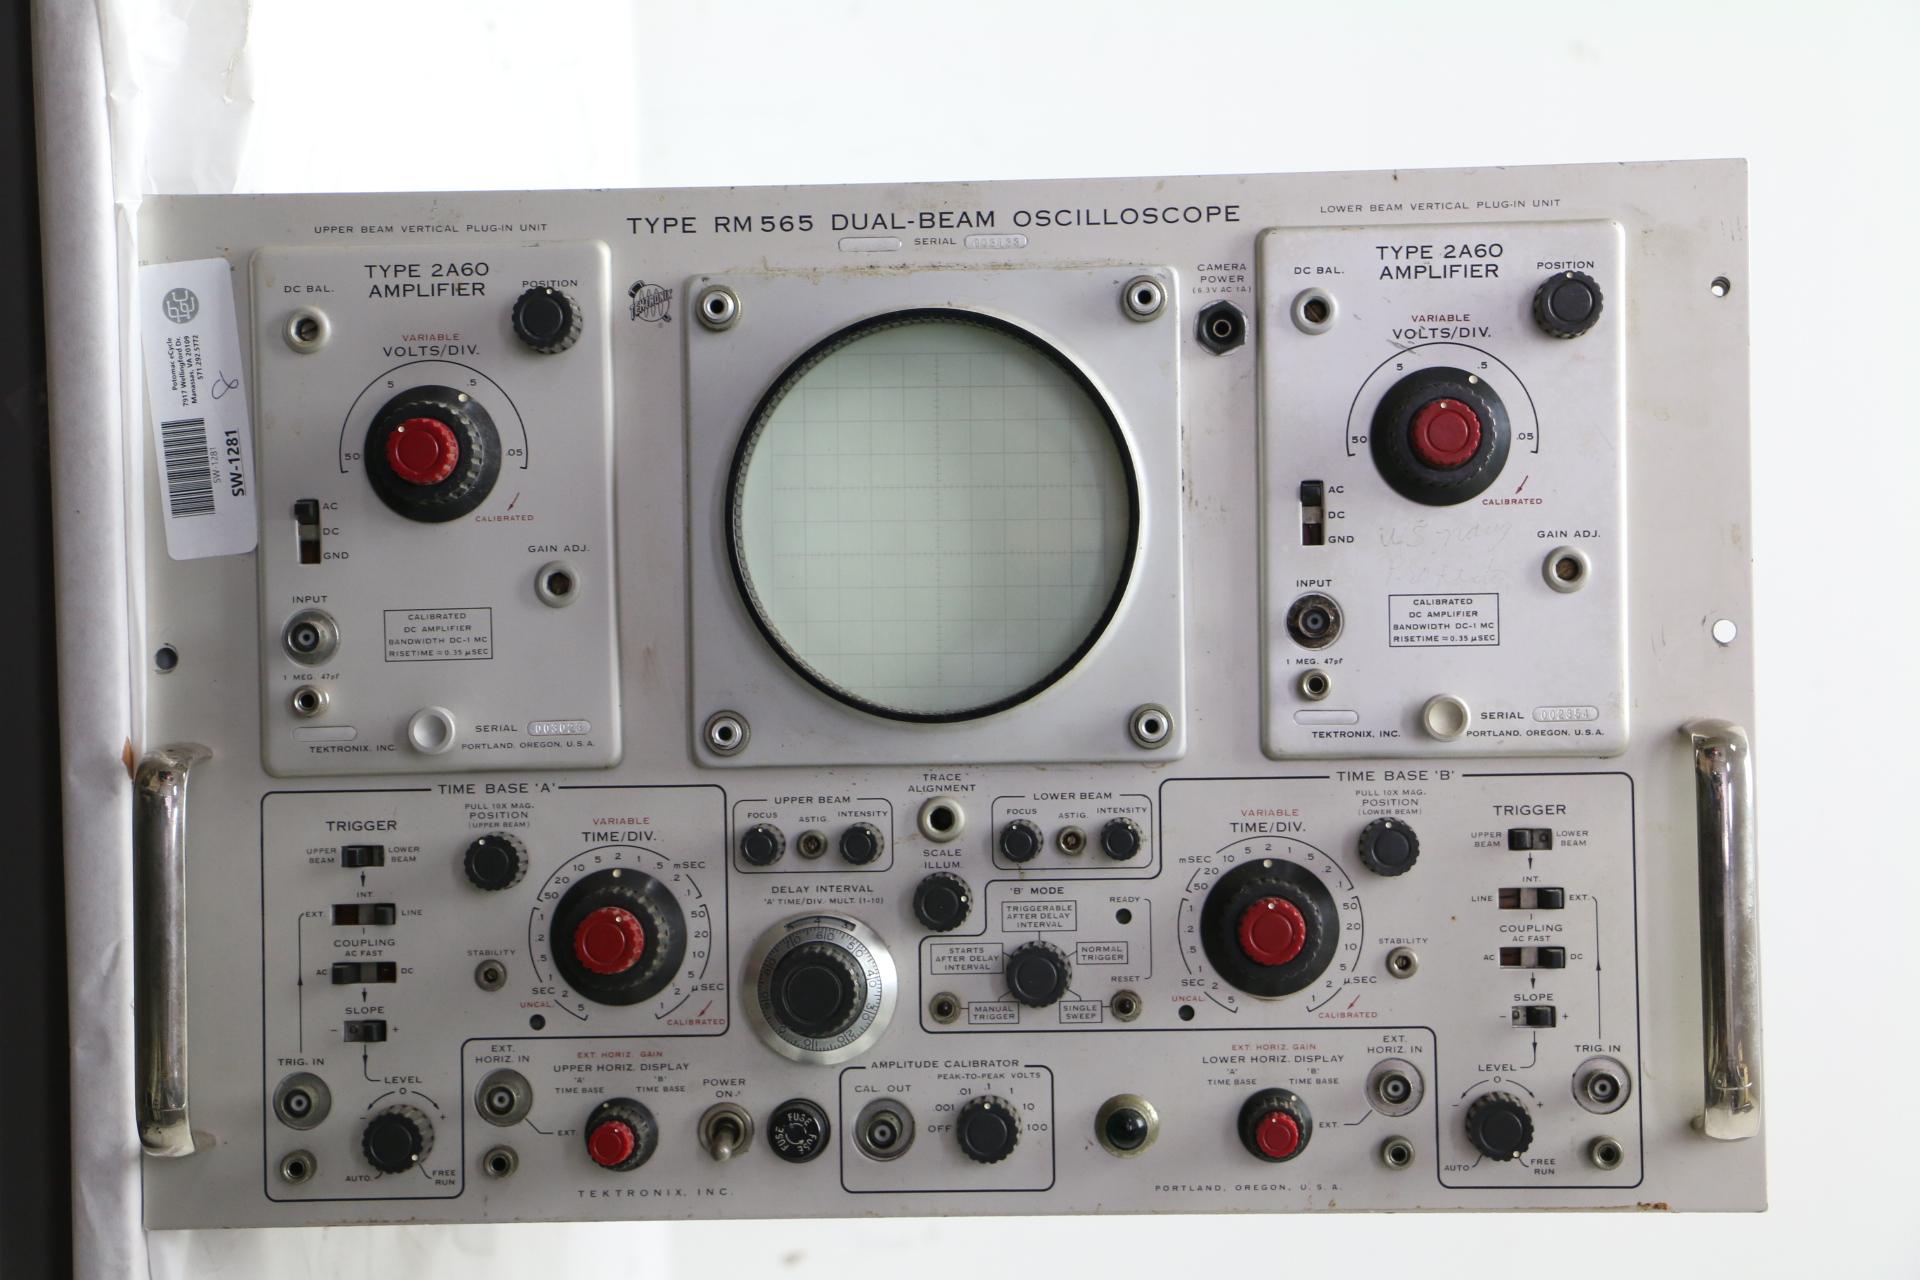 Vintage Tektronix Oscilloscopes : Vintage tektronix rm dual beam oscilloscope w type